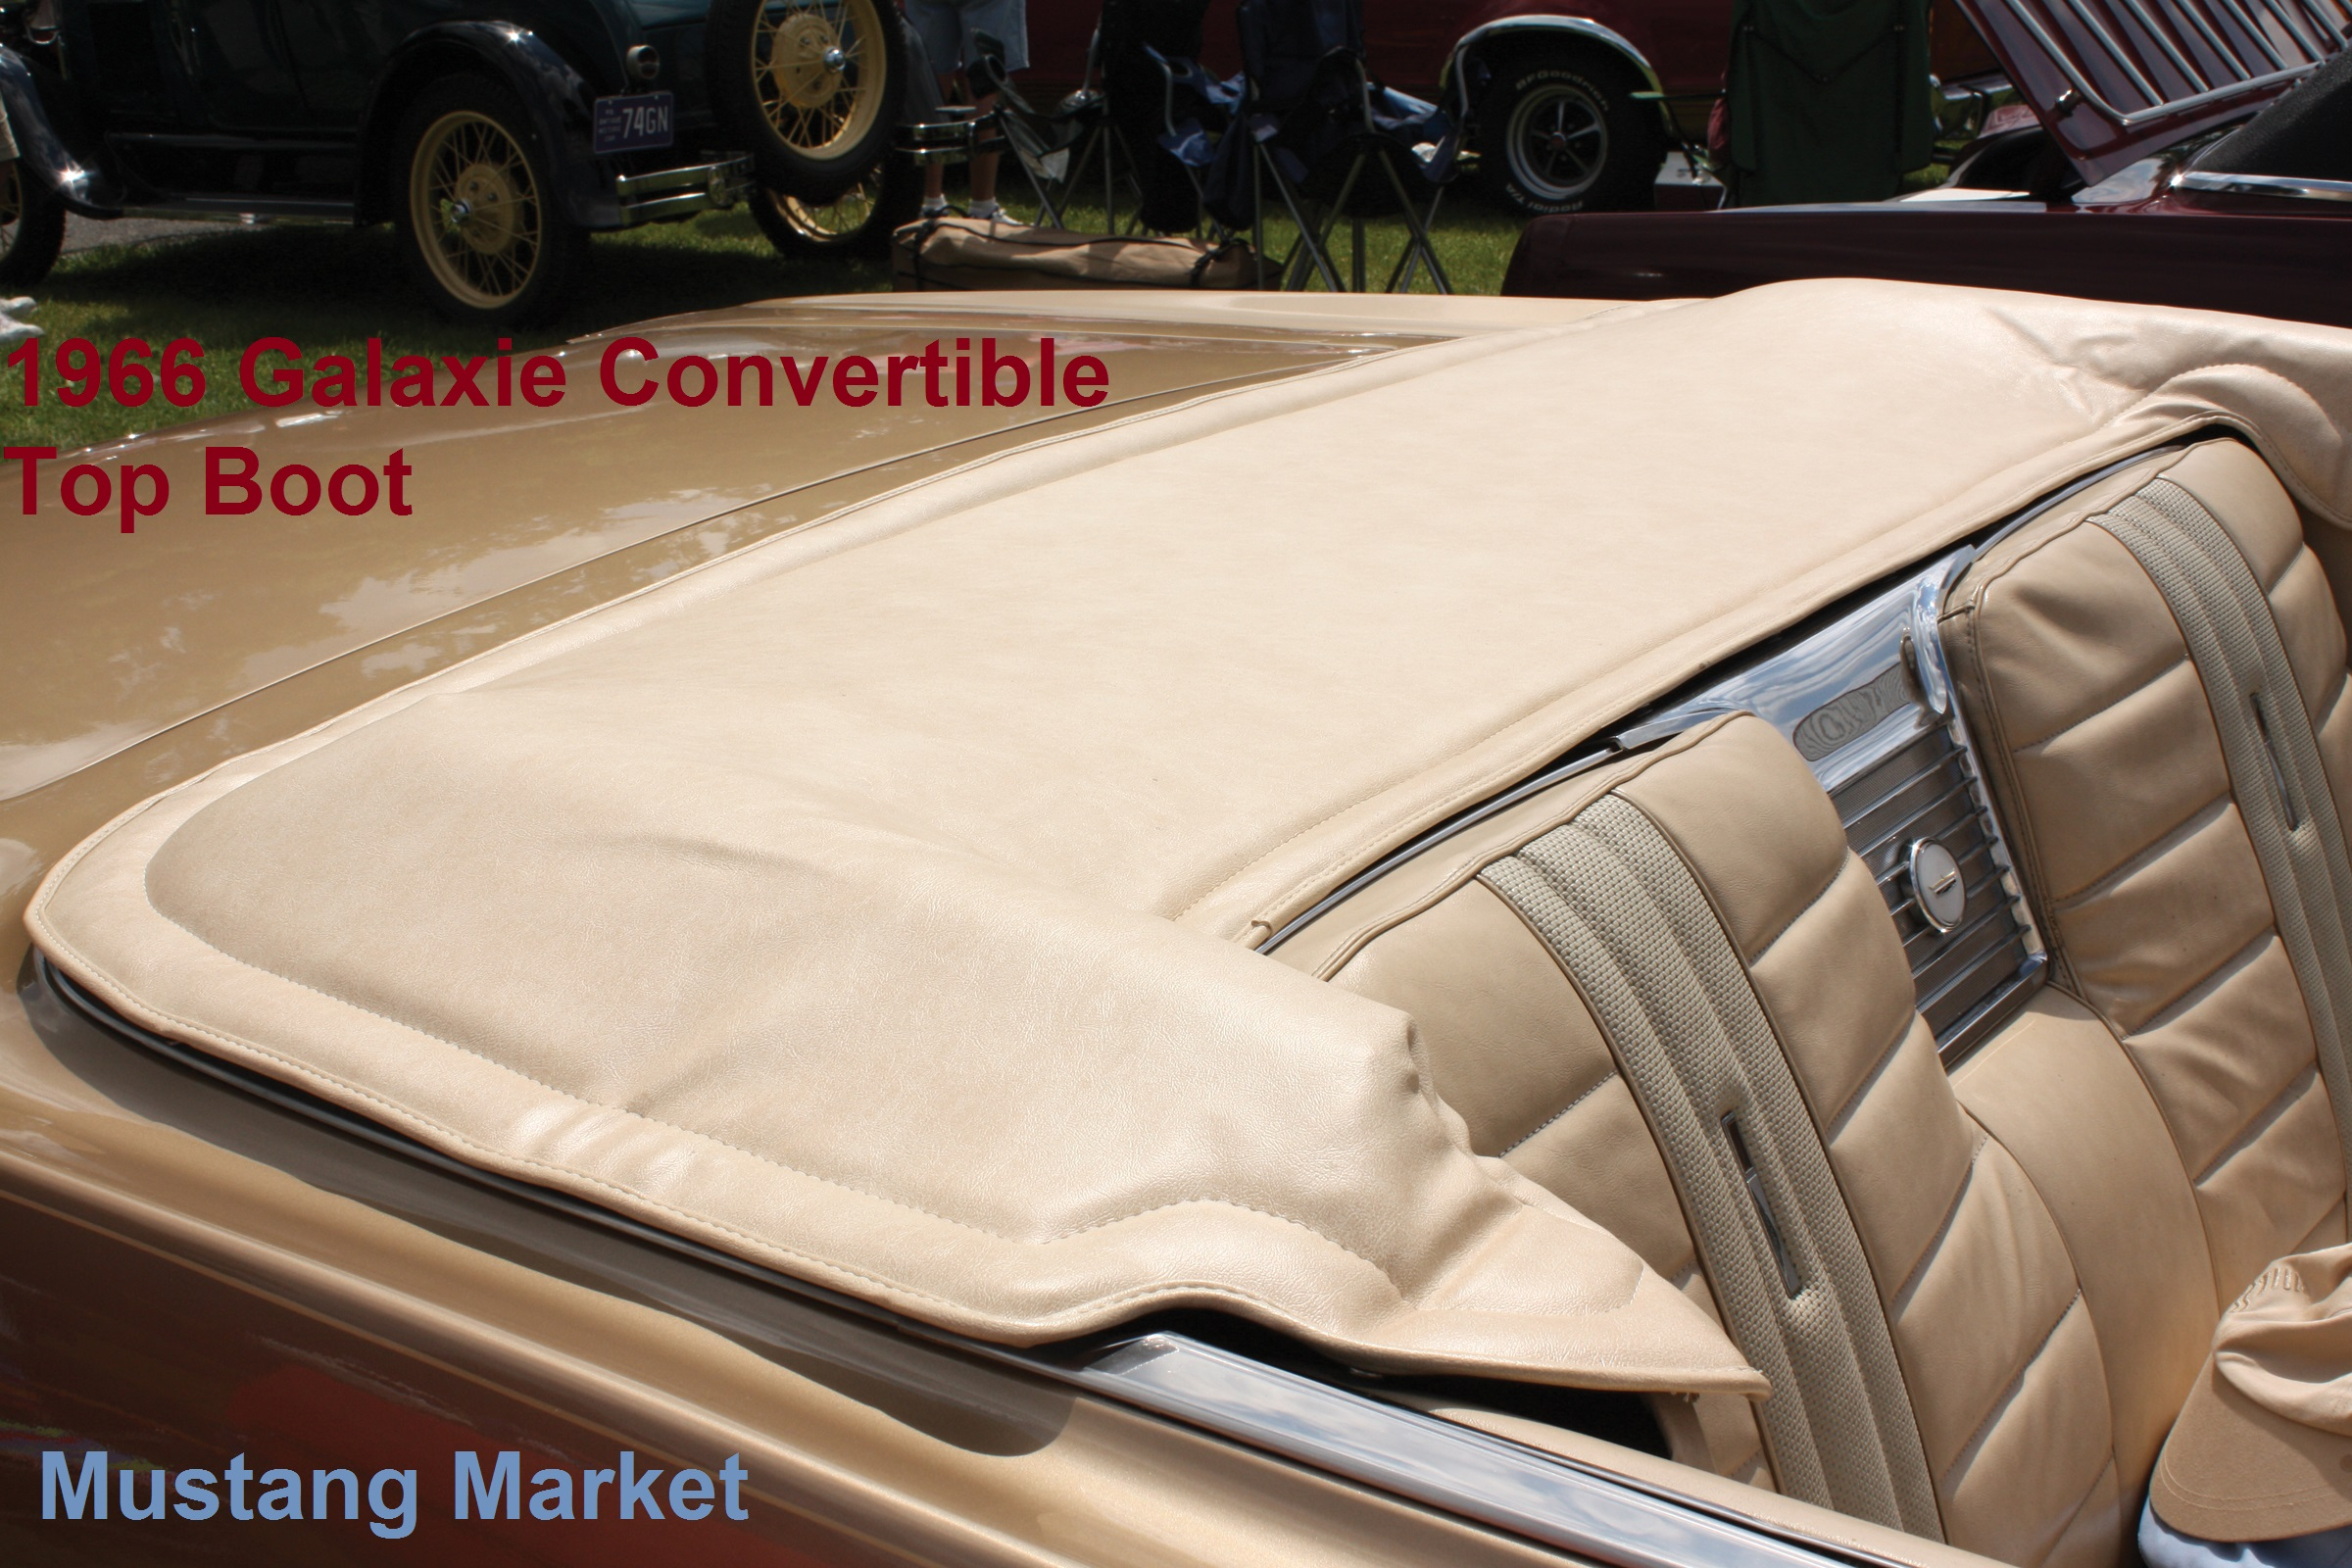 1966 Galaxie Convertible Top Boot